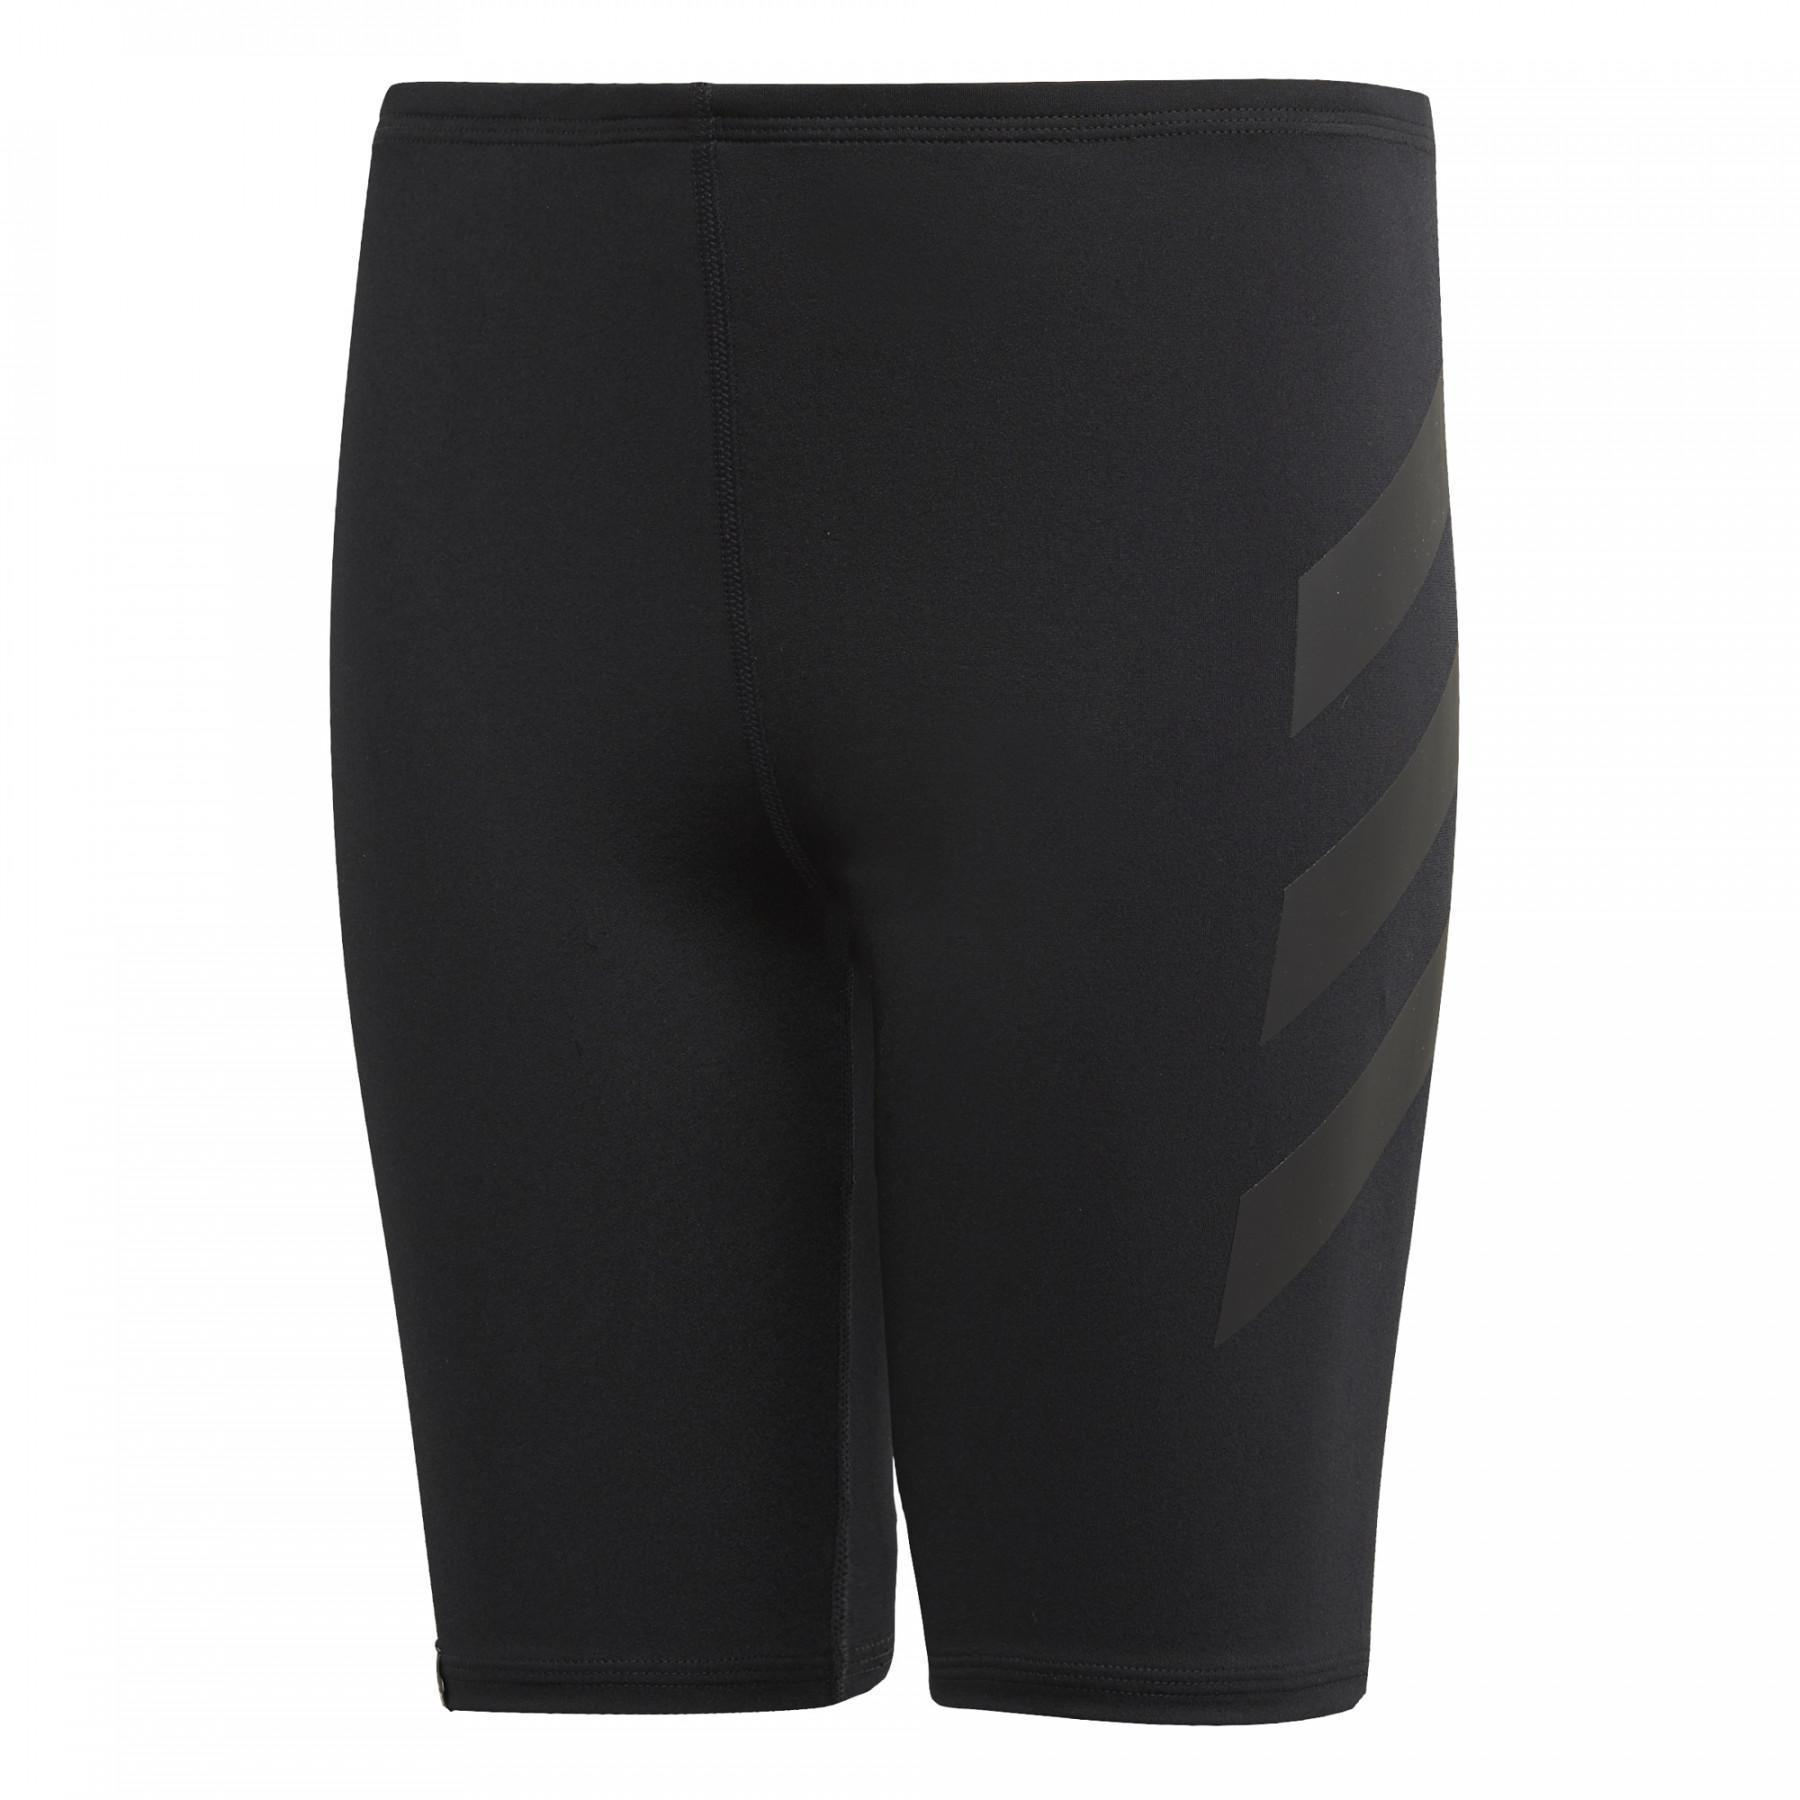 Children's swimming shorts adidas Pro